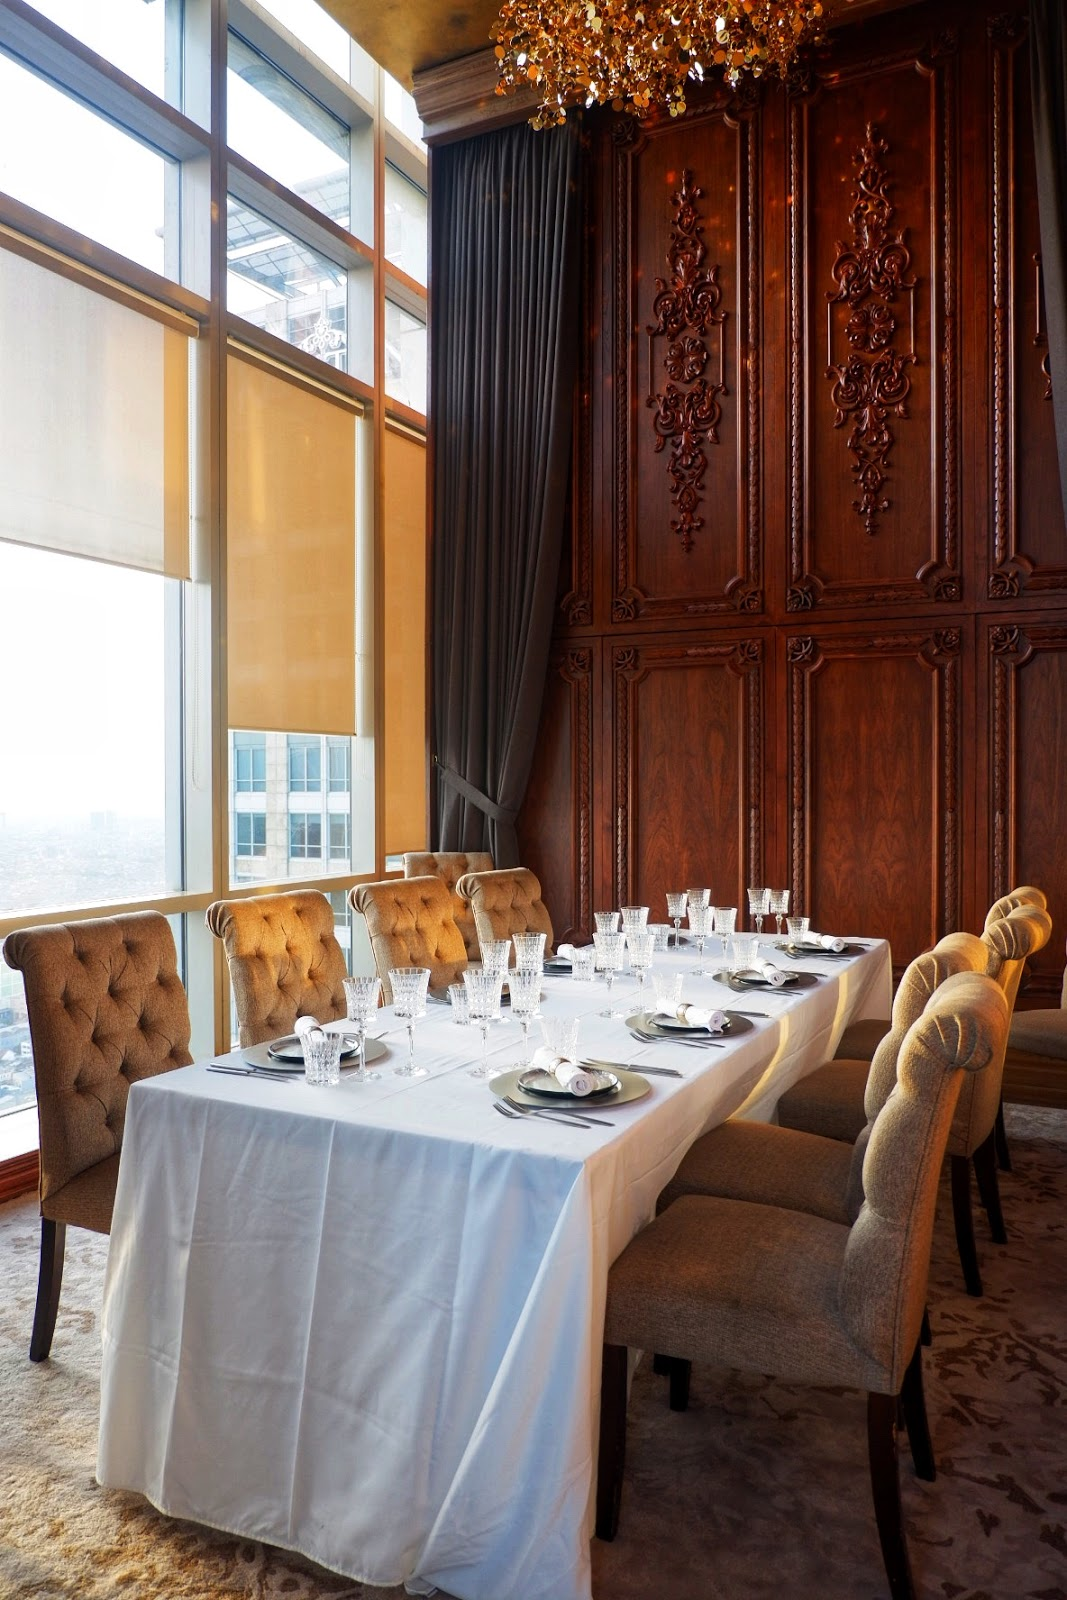 15/09/2015· berada di ketinggian, restoran ini tidak hanya menawarkan panorama ibu kota jakarta, tetapi juga deretan menu terbaik asal jepang, italia, dan australia. Oso Ristorante Jakarta Italian Culinary Is Here Oppakuliner